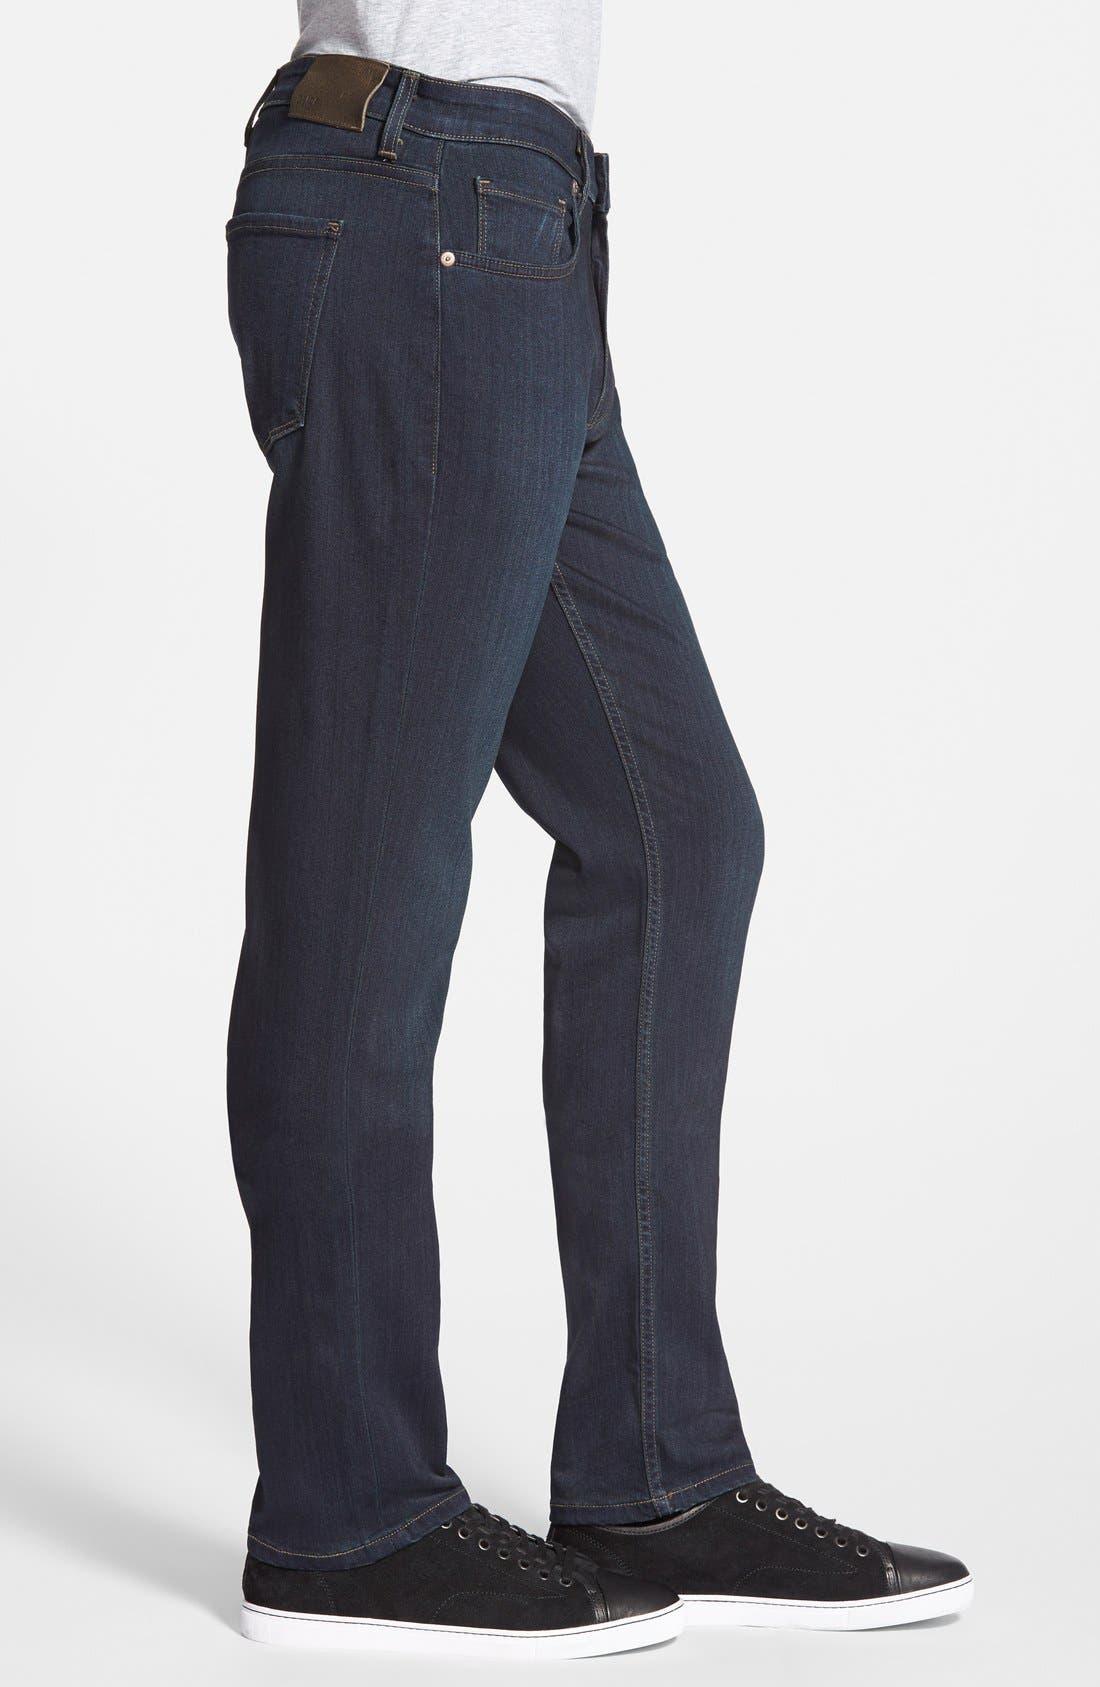 PAIGE, Transcend - Federal Slim Straight Leg Jeans, Alternate thumbnail 6, color, CELLAR/ CELLAR